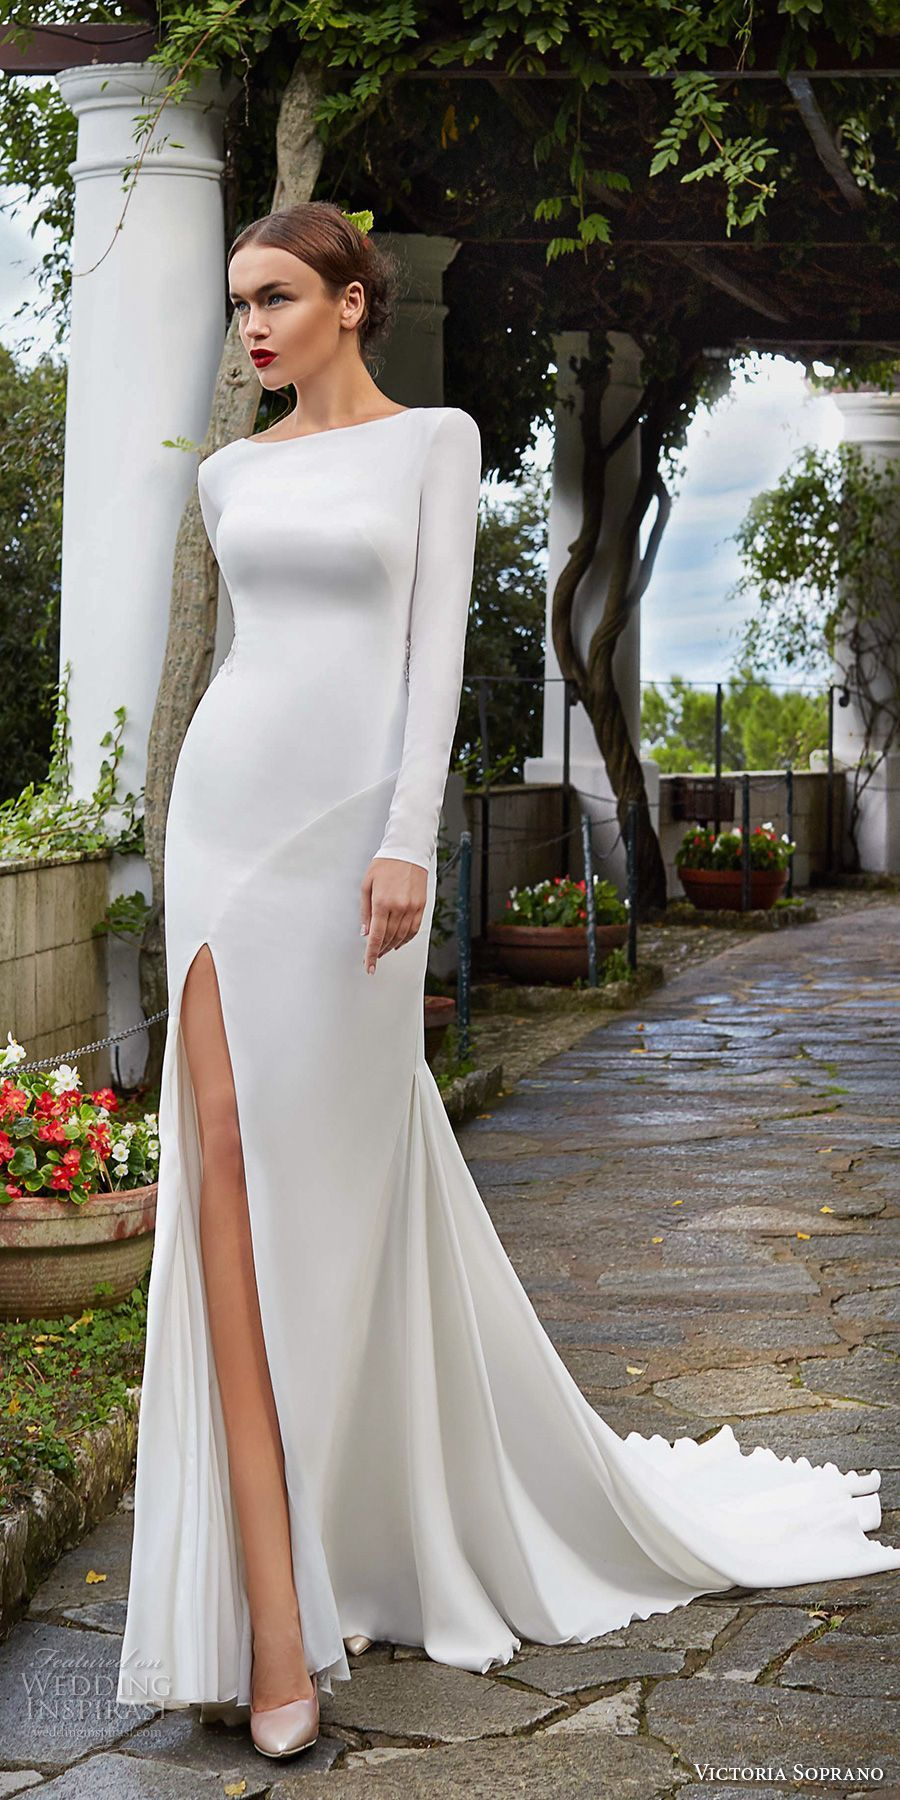 Victoria soprano bridal long sleeves bateau neck simple clean